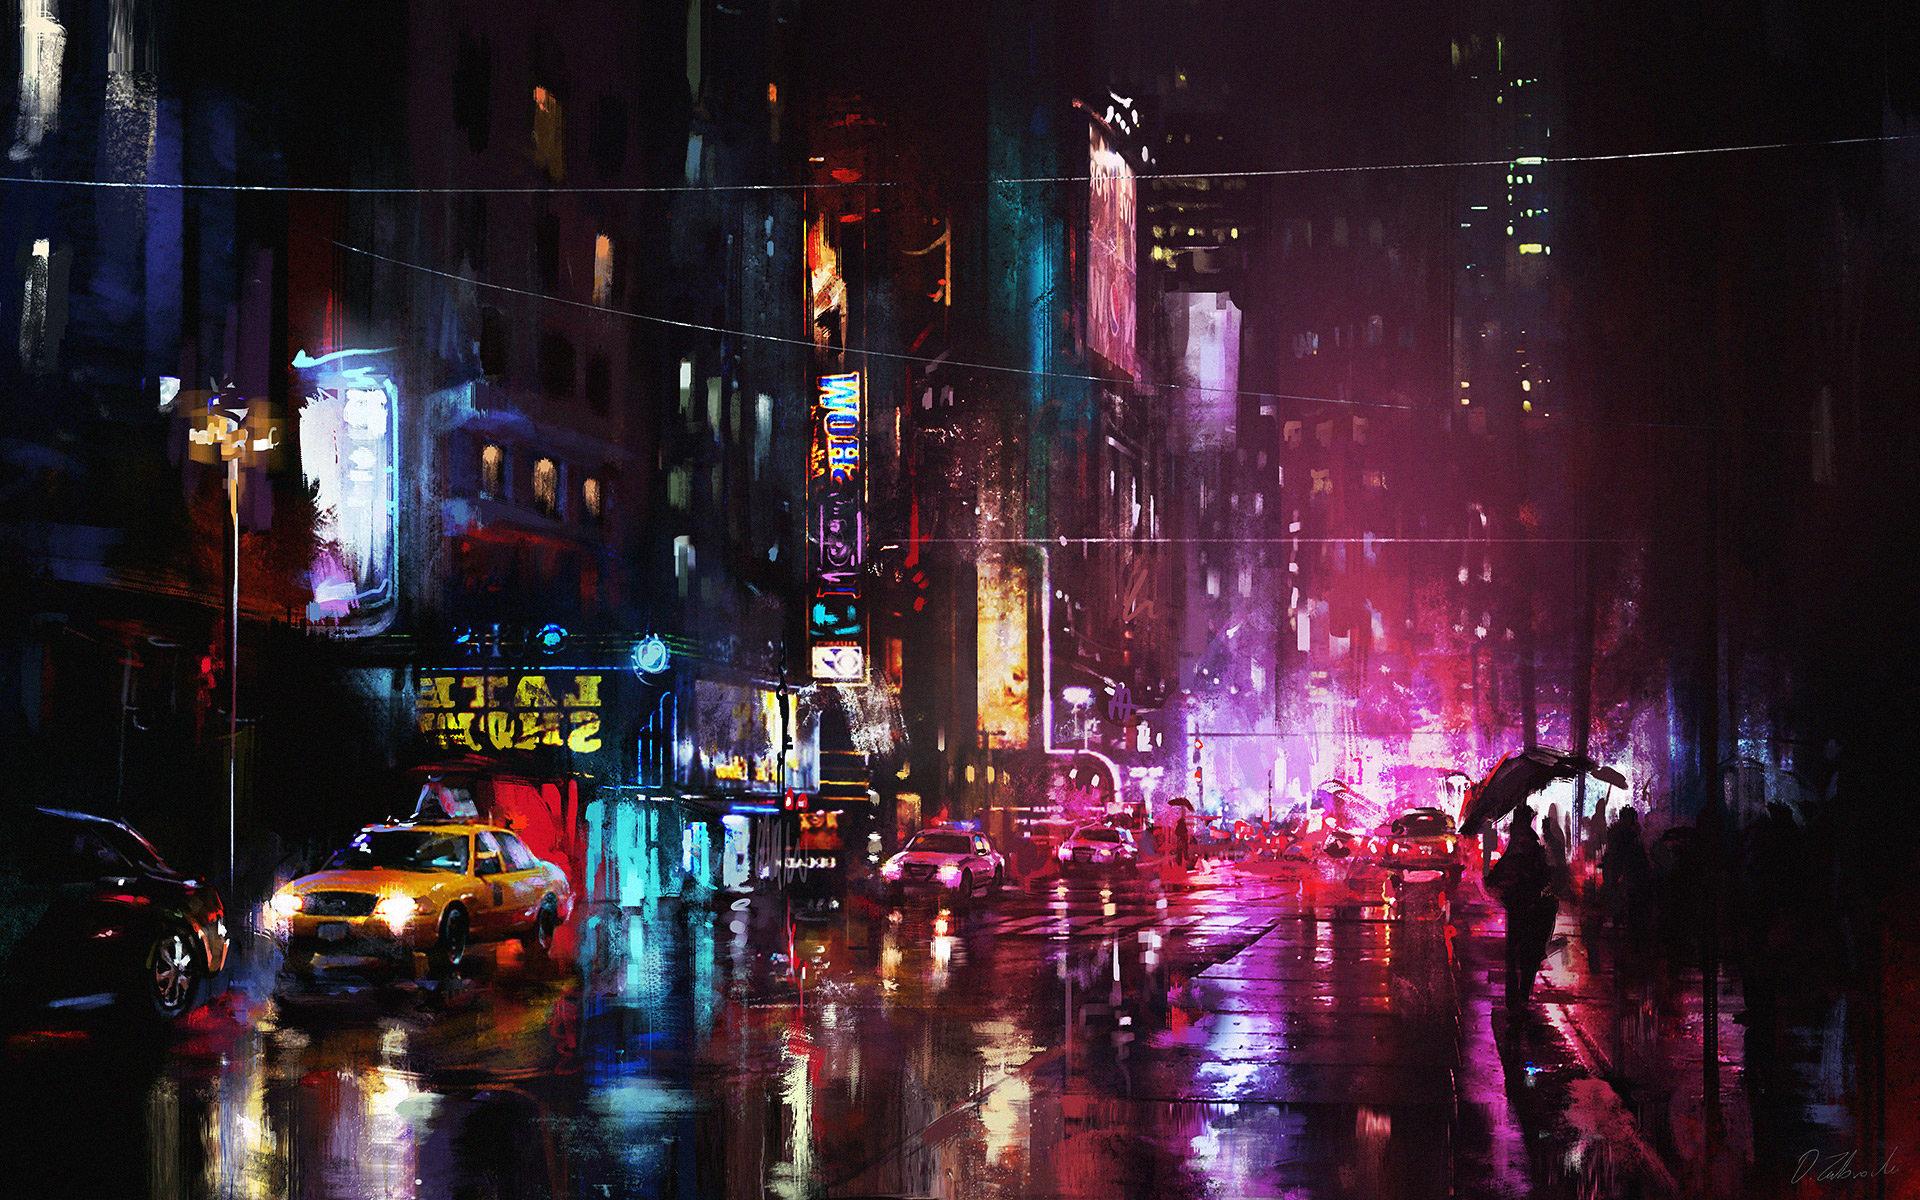 Red Lights by Darek Zabrocki